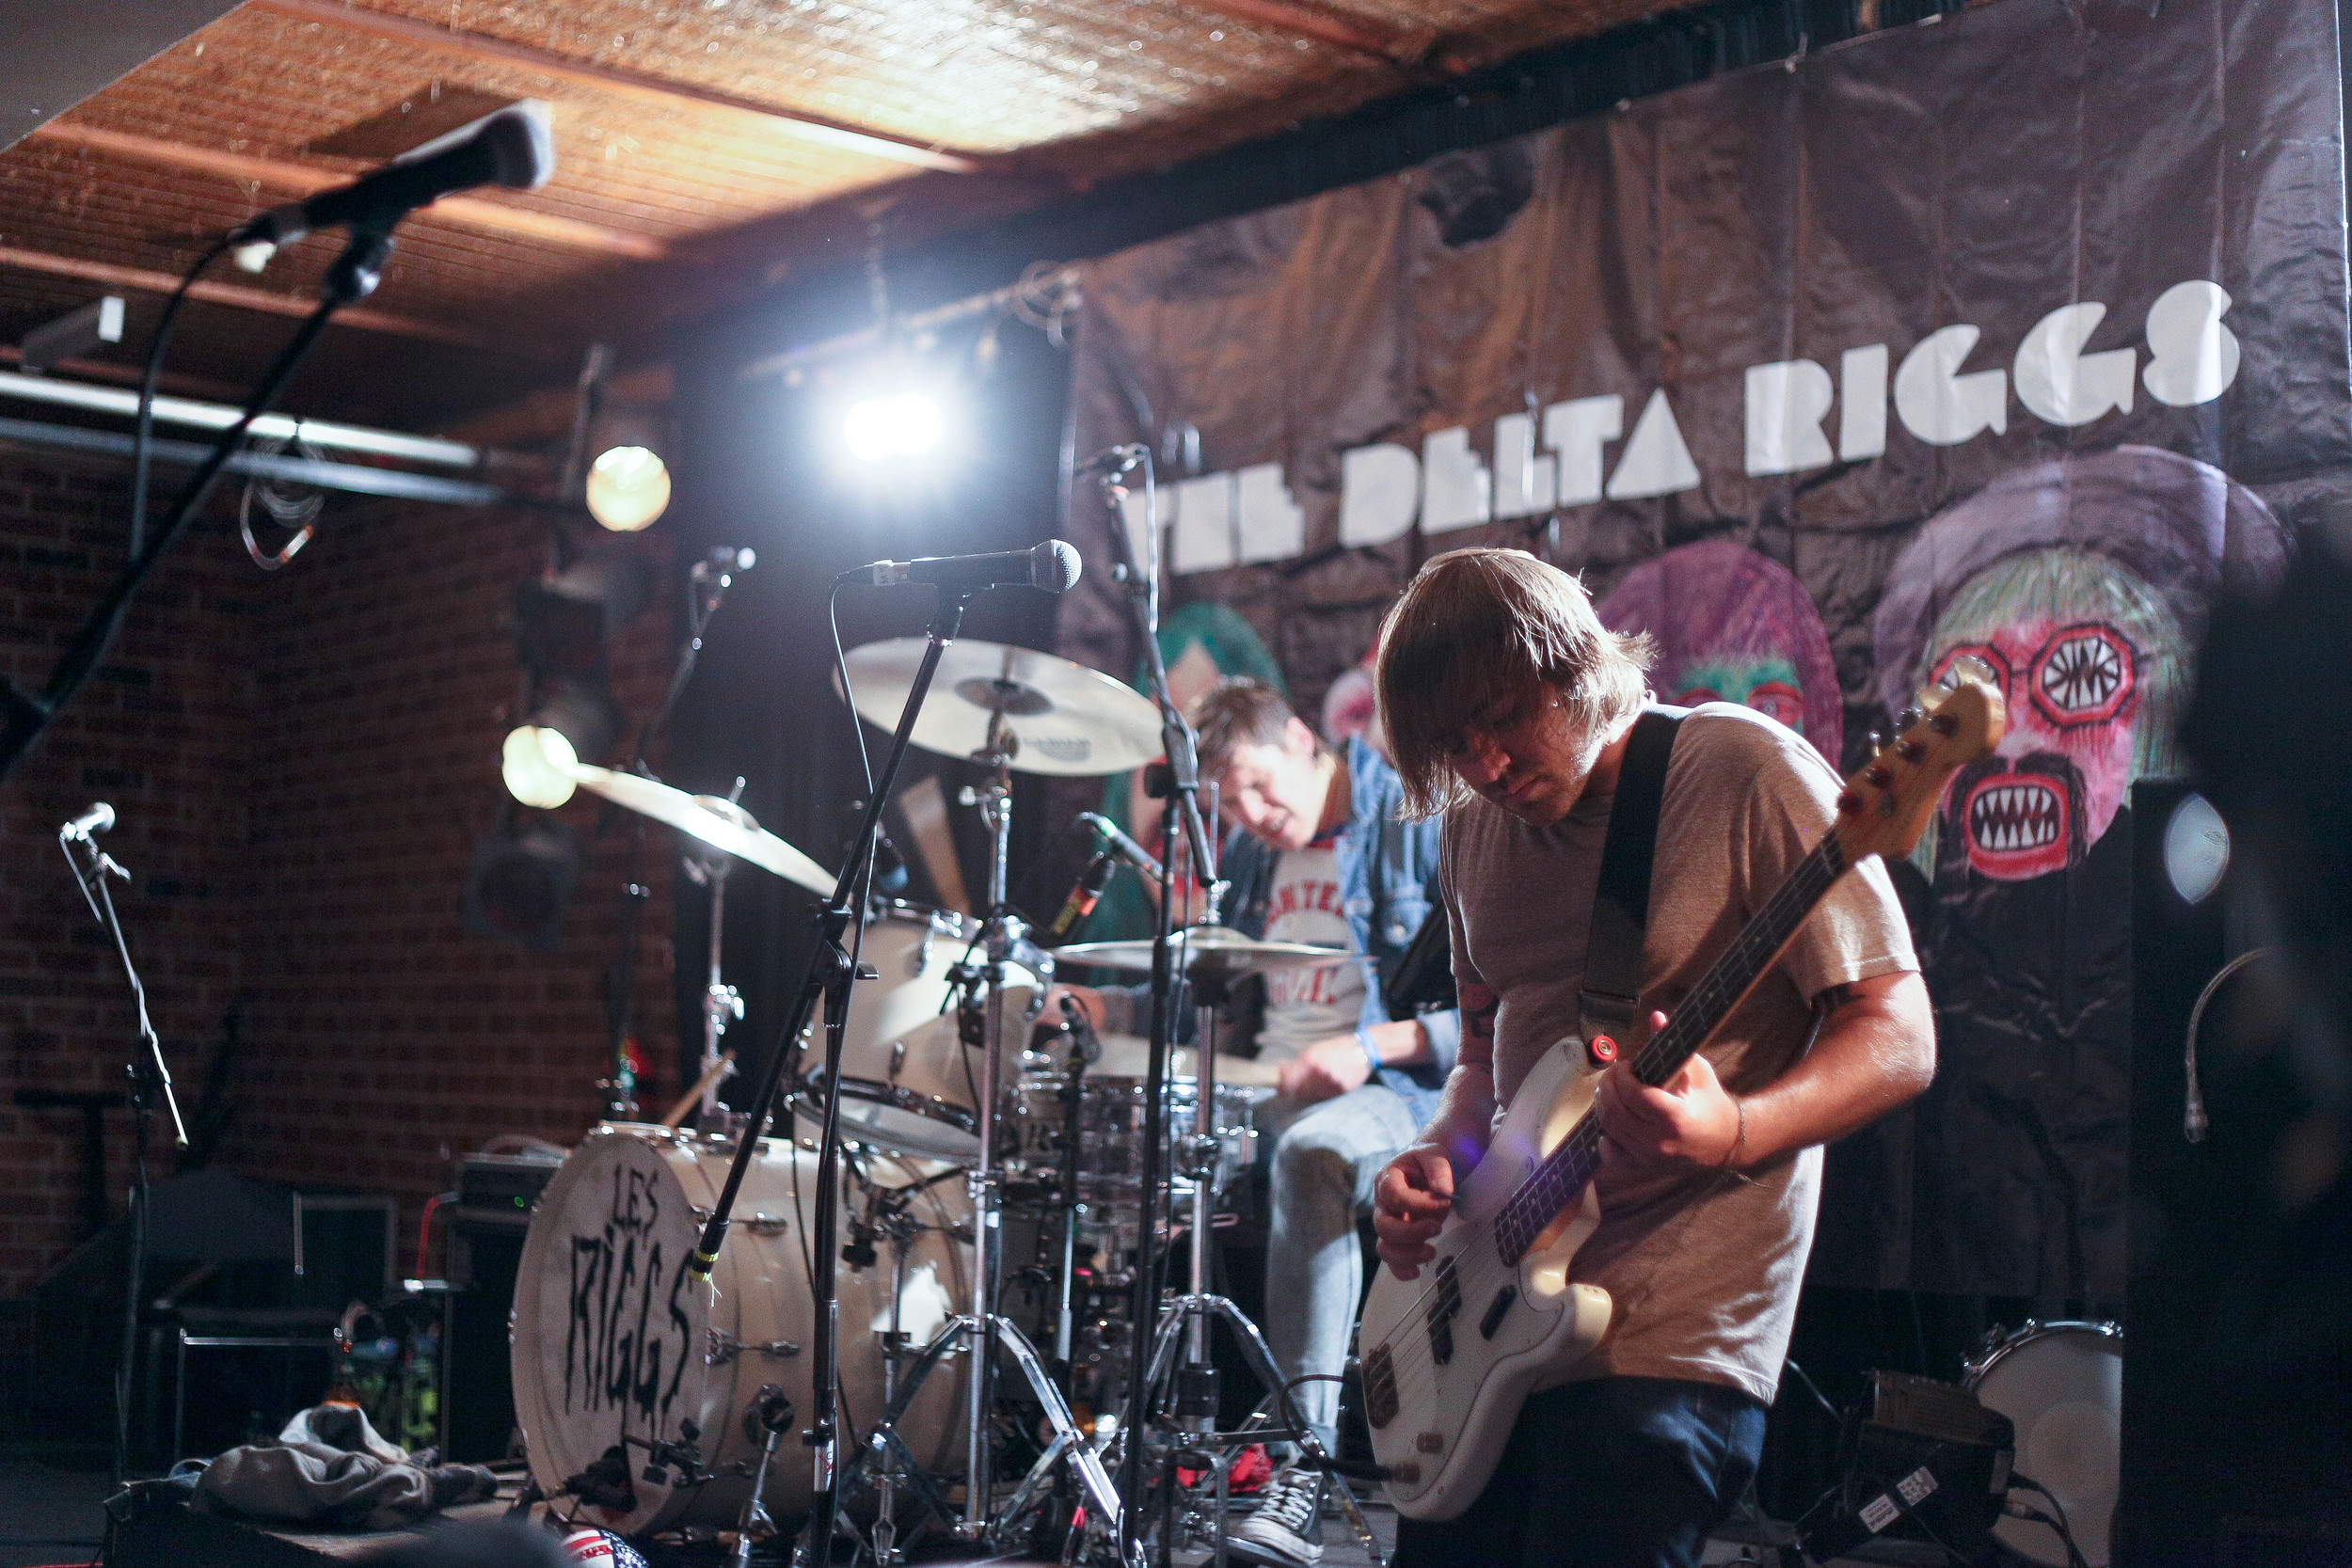 The Delta Riggs live at Adelaide Uni Bar last November